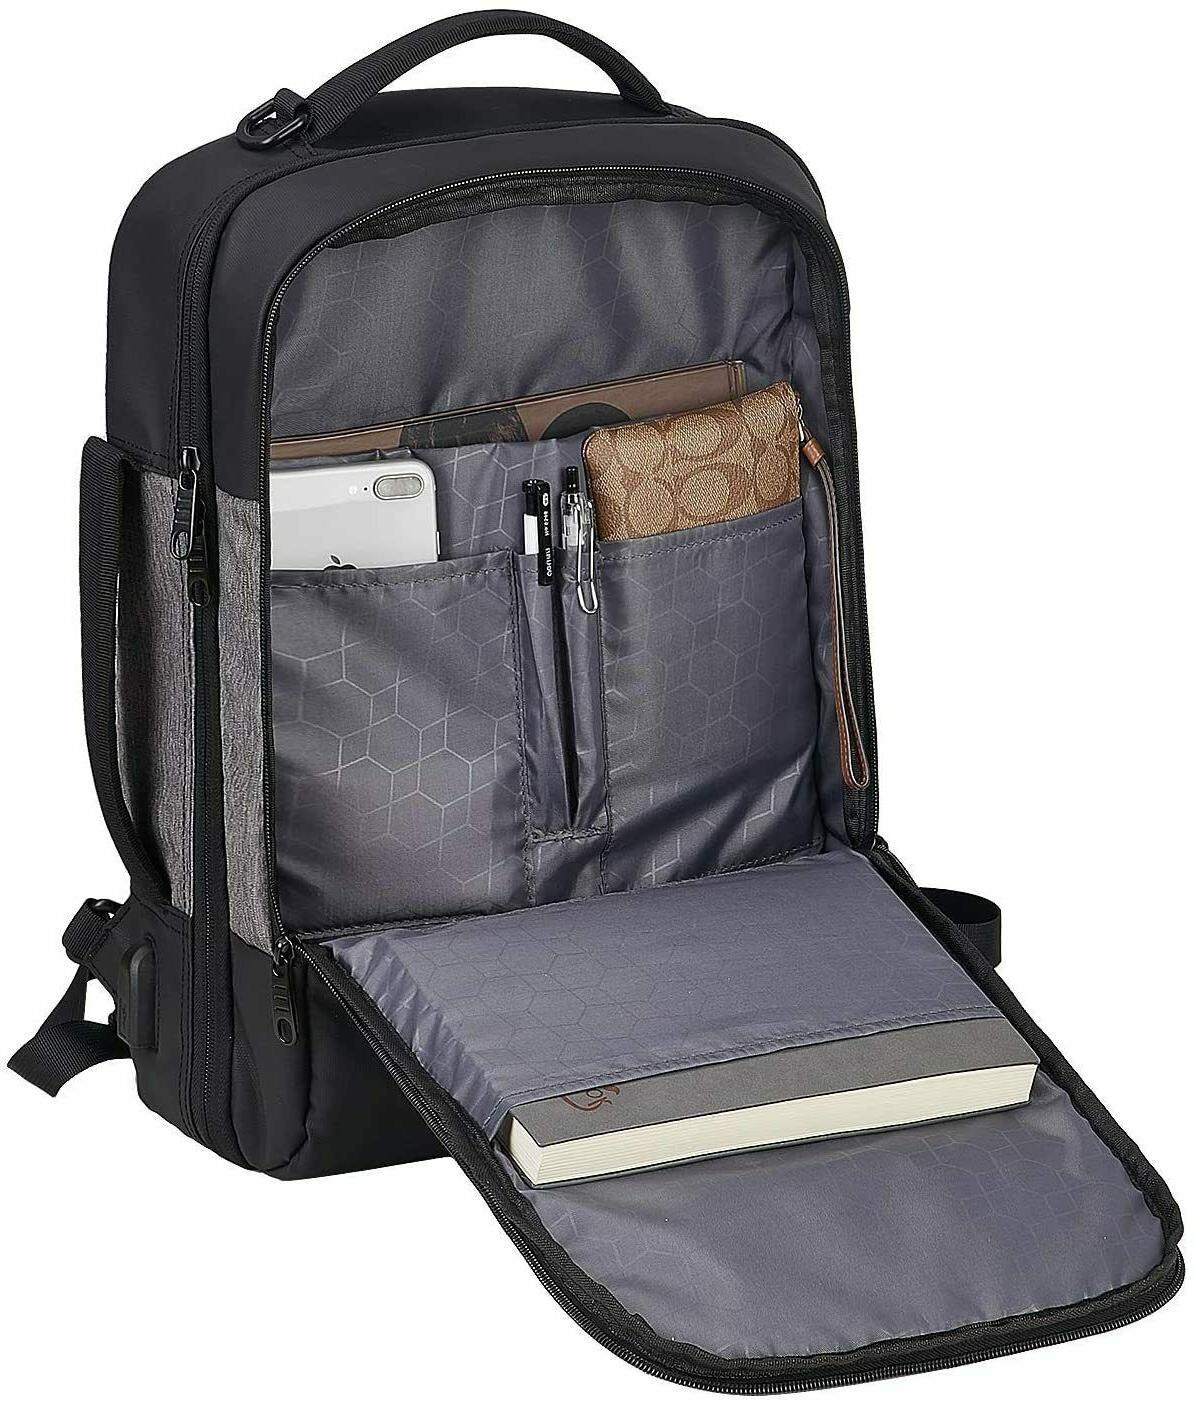 Laptop Men,Travel Backpack 15.6 Inch Laptop usb port